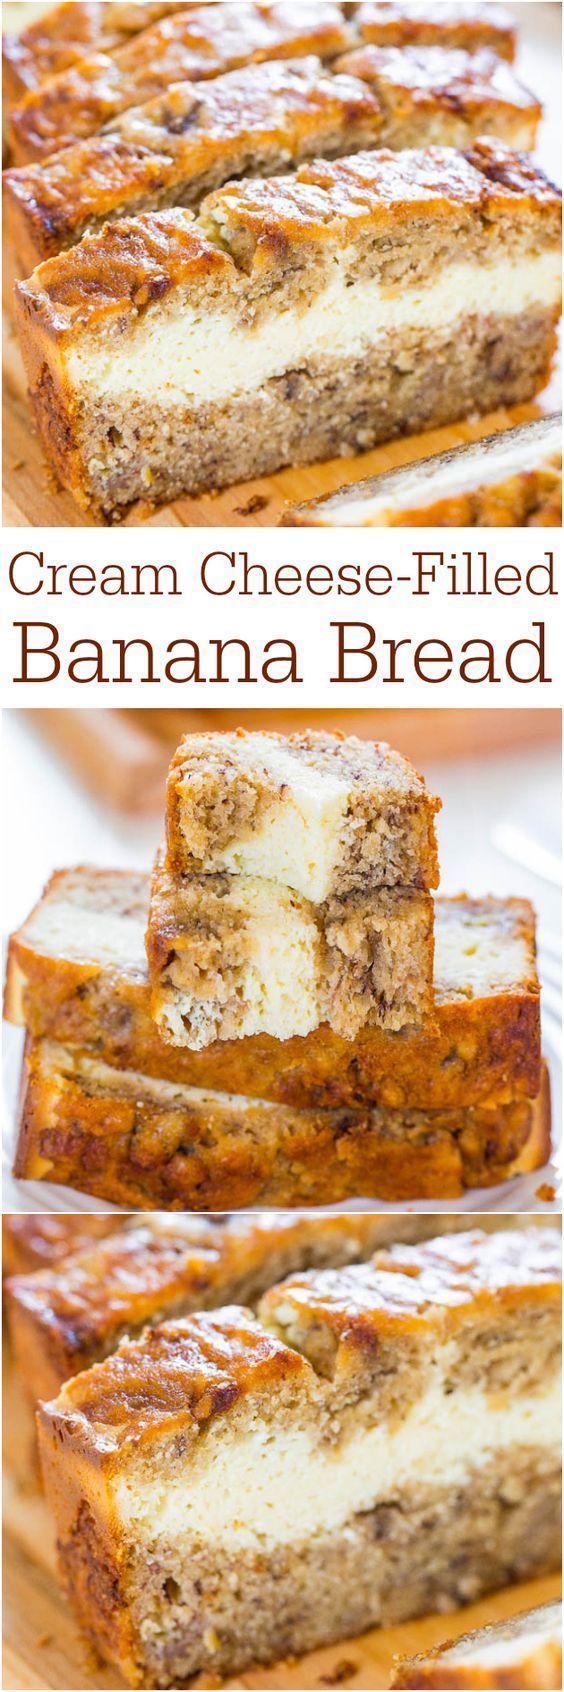 Cream Cheese-Filled Banana Bread Recipe | Buzz Inspired